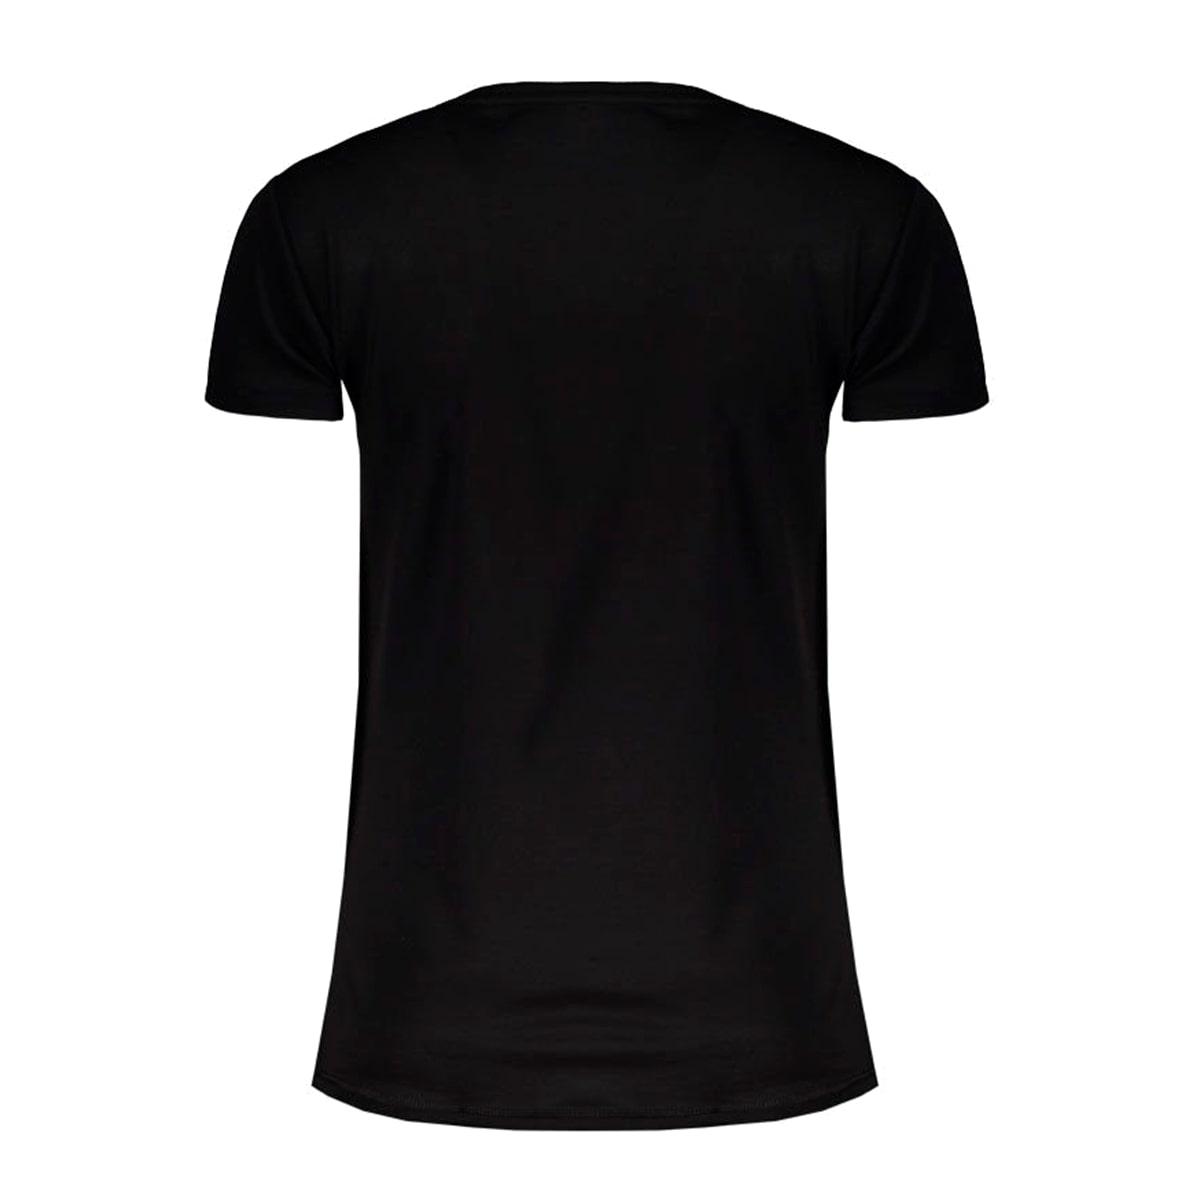 Camiseta Puma Active Tee Infantil Feminina Preto